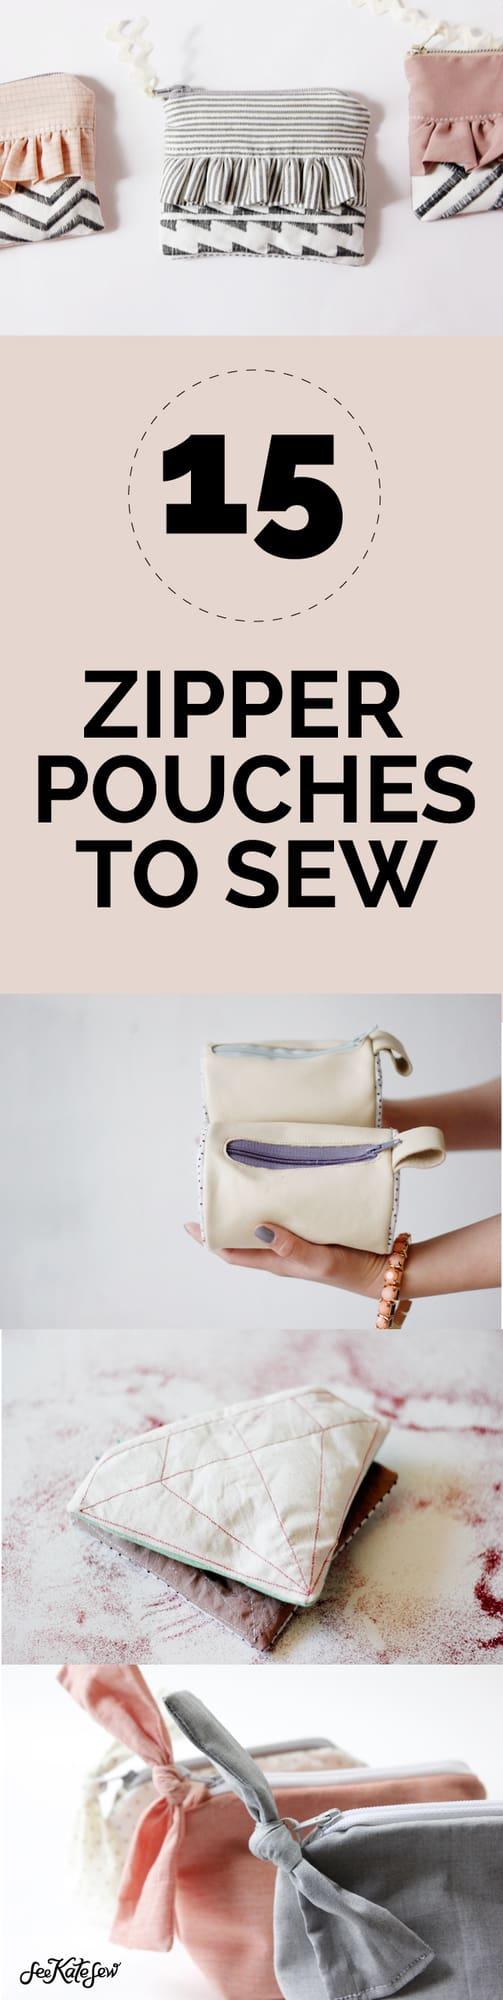 15 Zipper Pouch Tutorials | diy copper pouches | how to sew a zipper pouch | free zipper pouch tutorial || See Kate Sew #zipperpouch #diyzipperpouch #freesewingtutorial